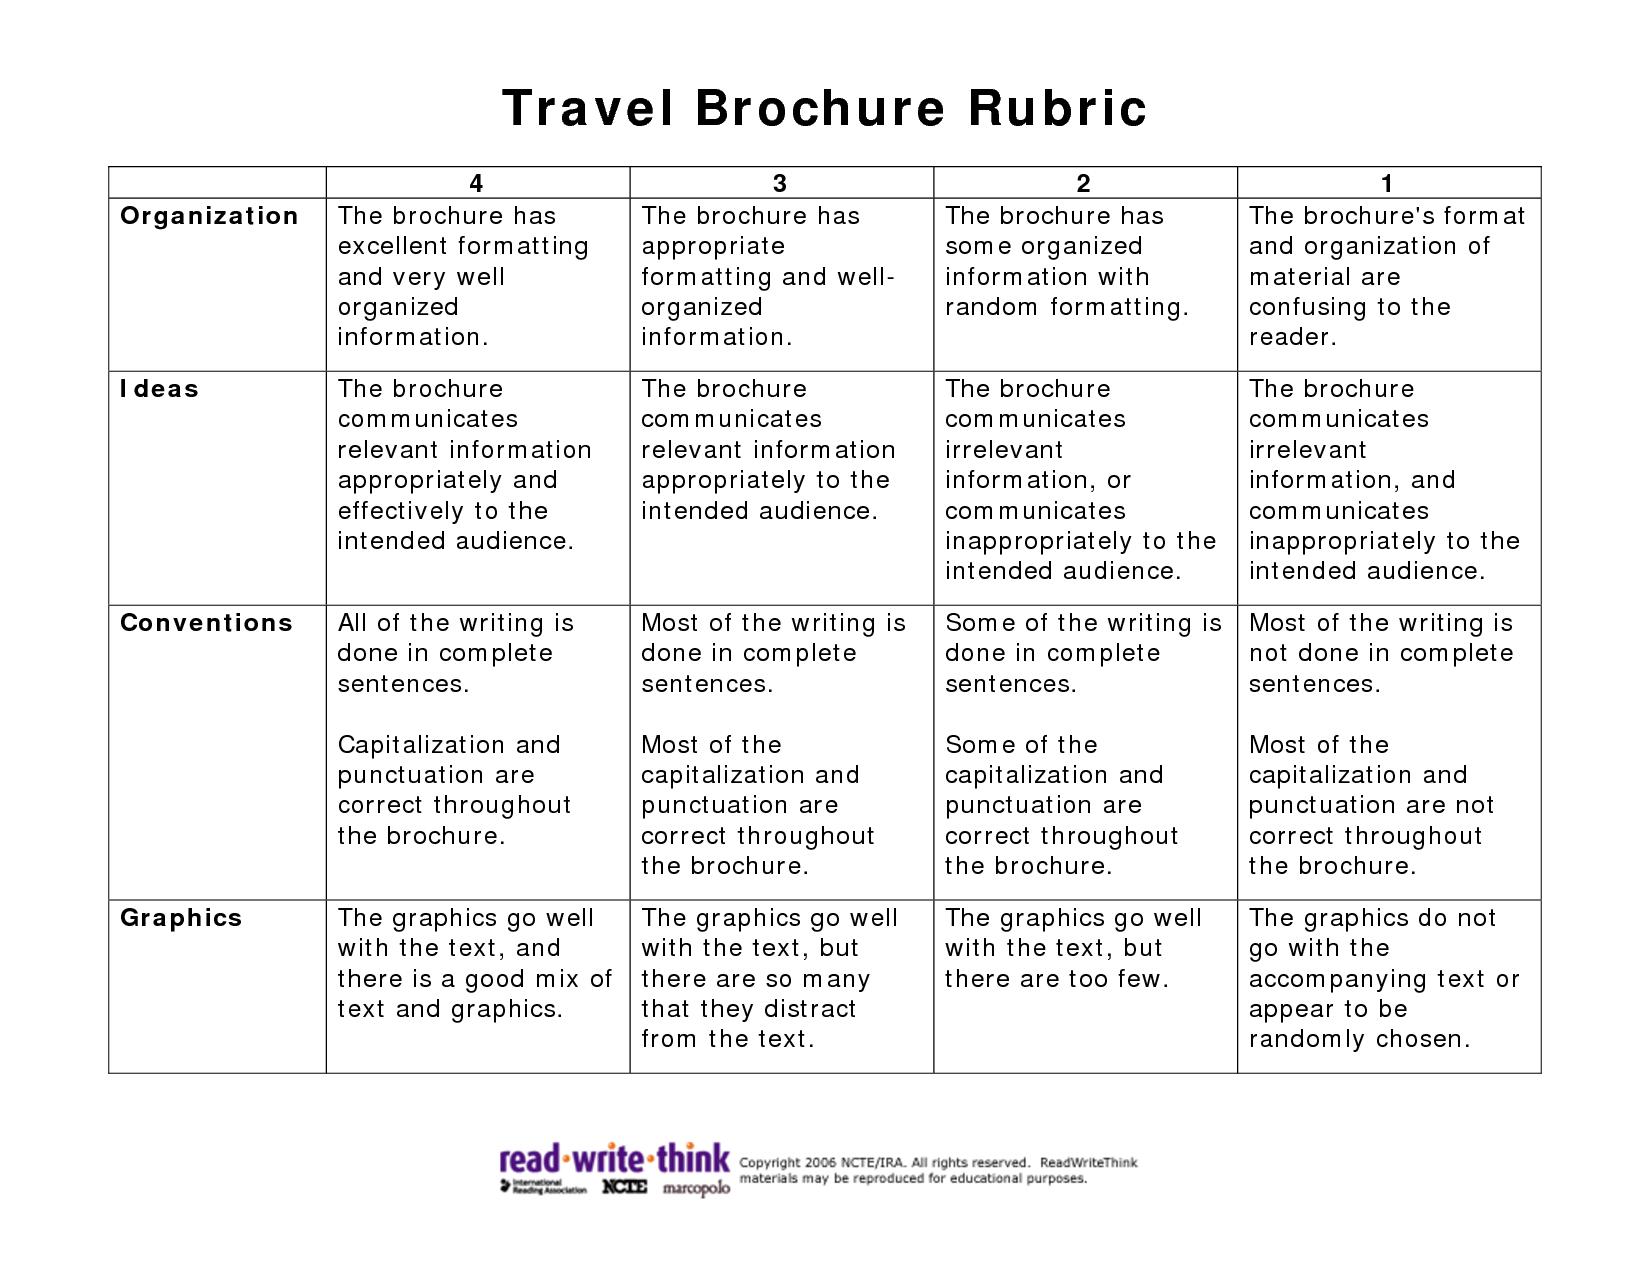 Travel Brochure Rubric | Rubrics, Travel Brochure, Social Regarding Brochure Rubric Template